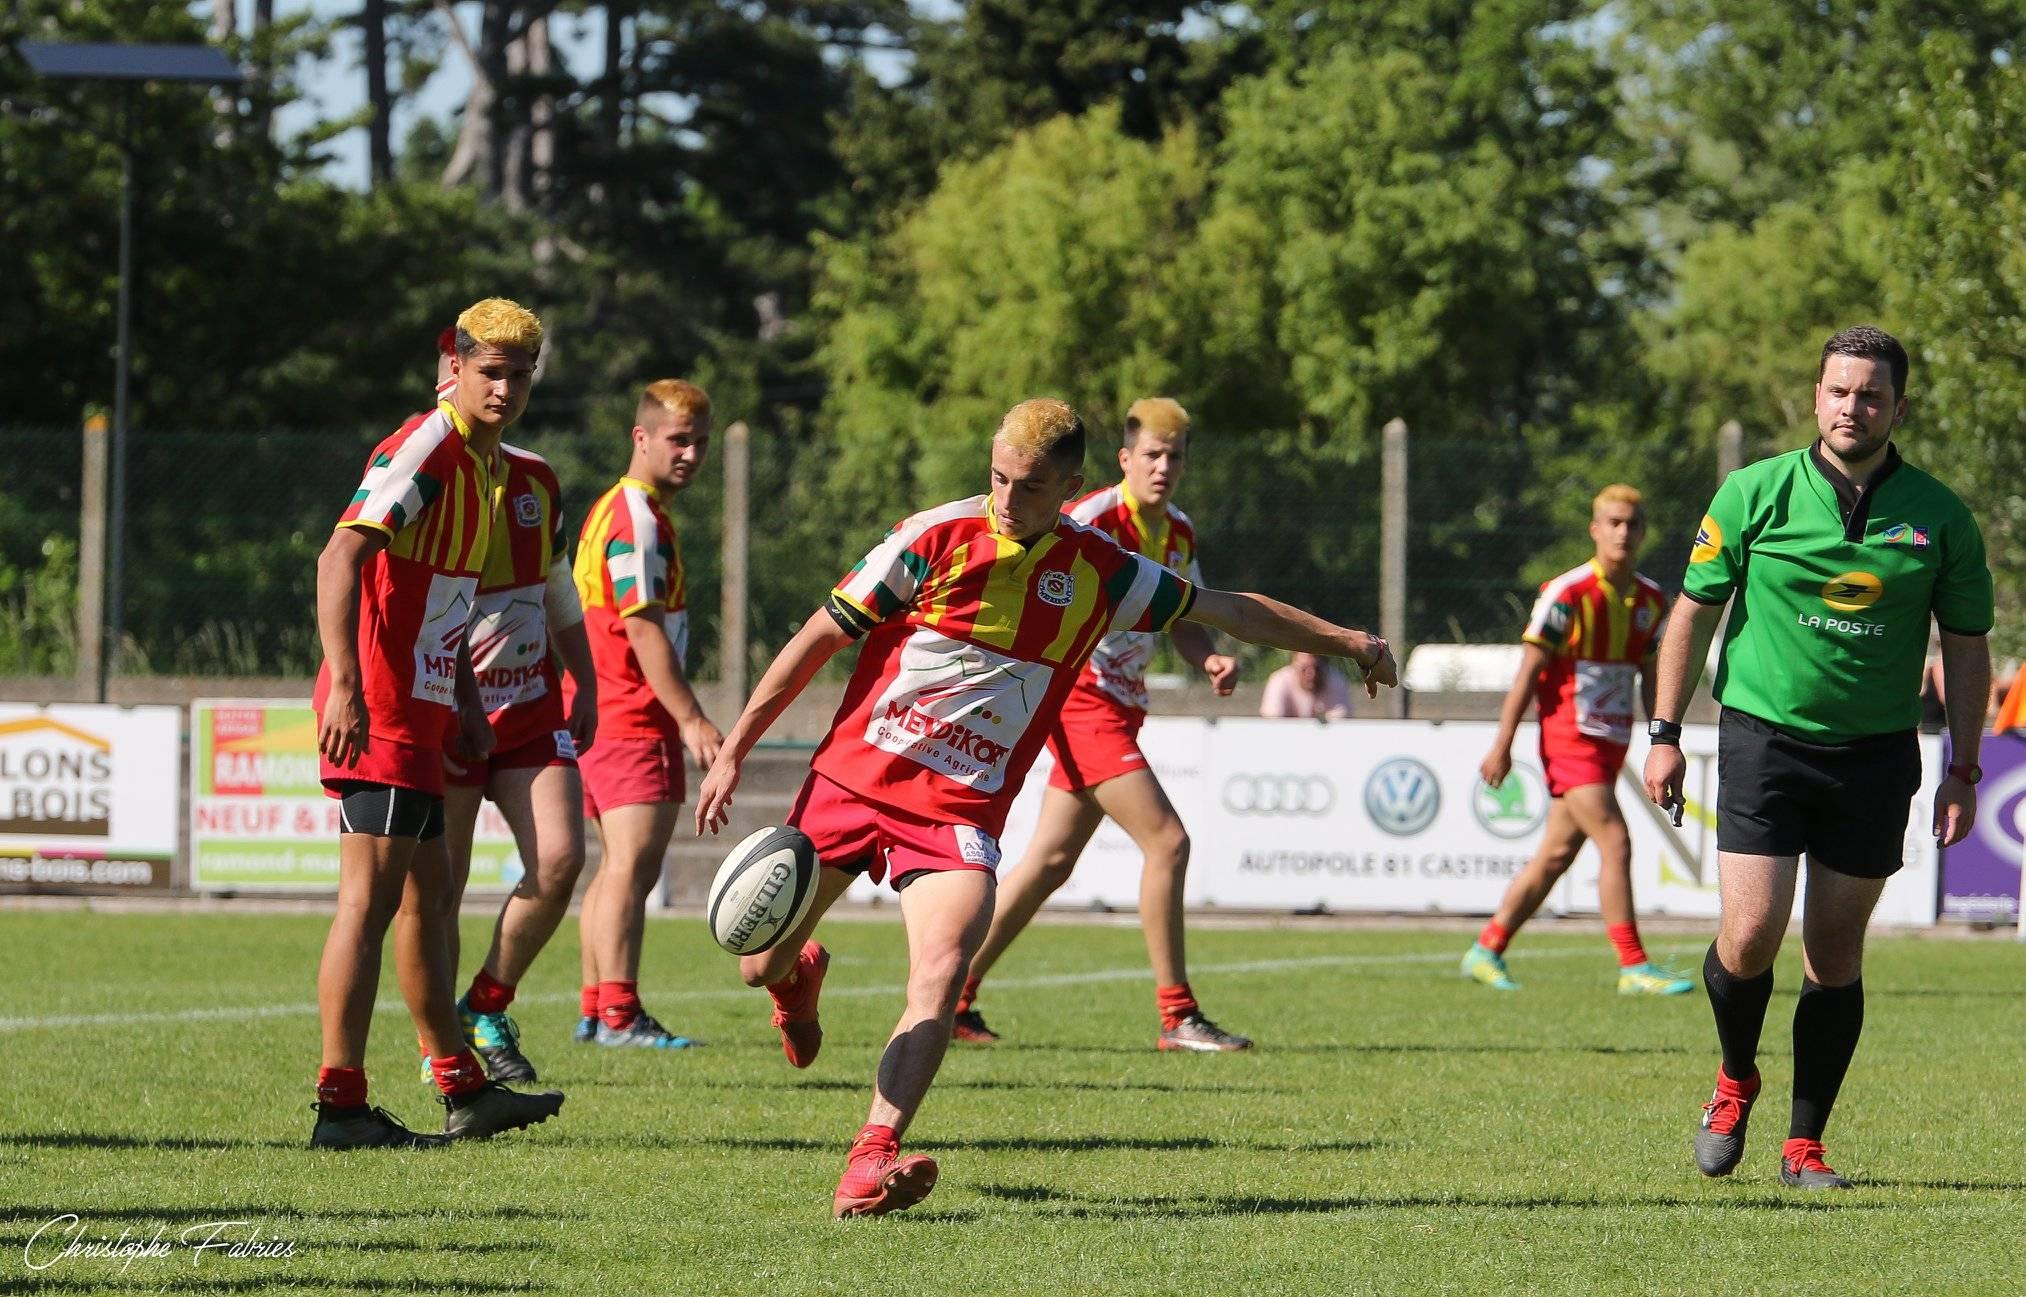 finale juniors 2019 nafarroa valence romans (1)